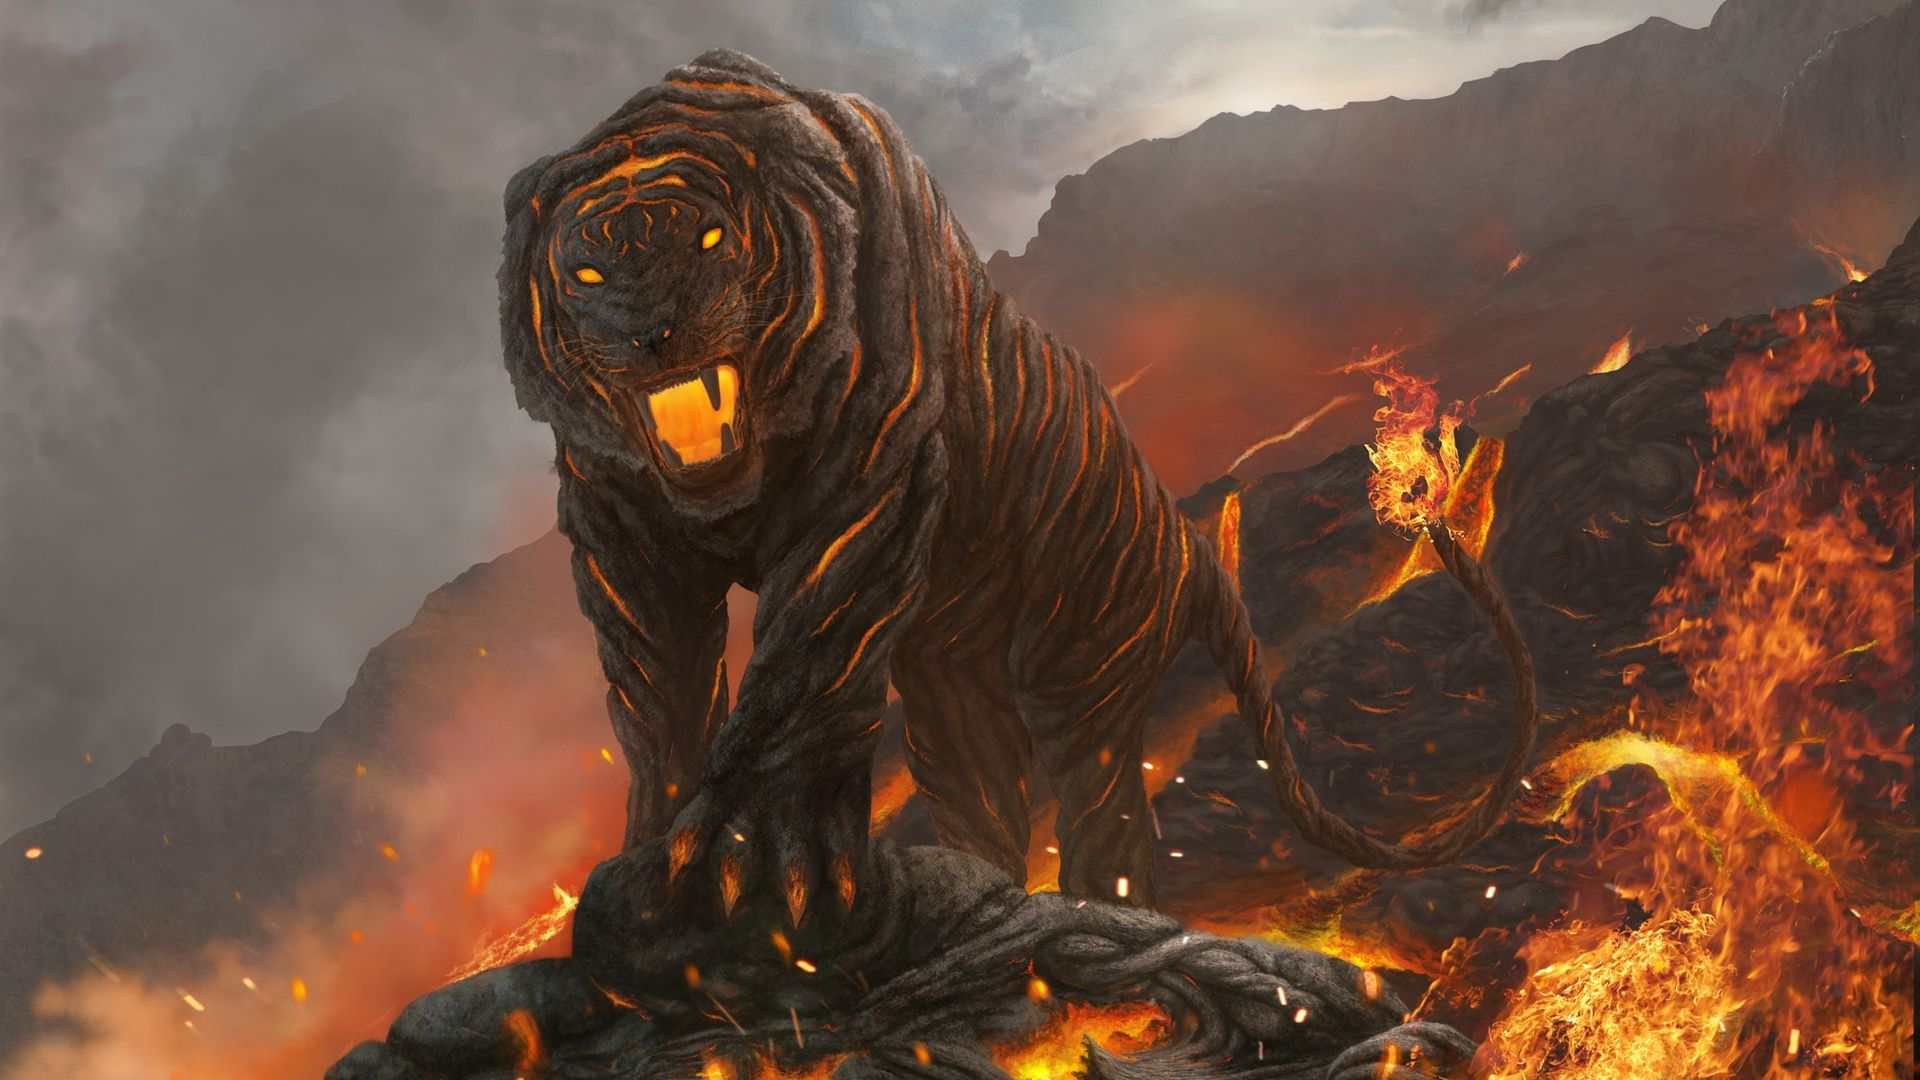 Tiger Magma Fire Art, Wallpaper